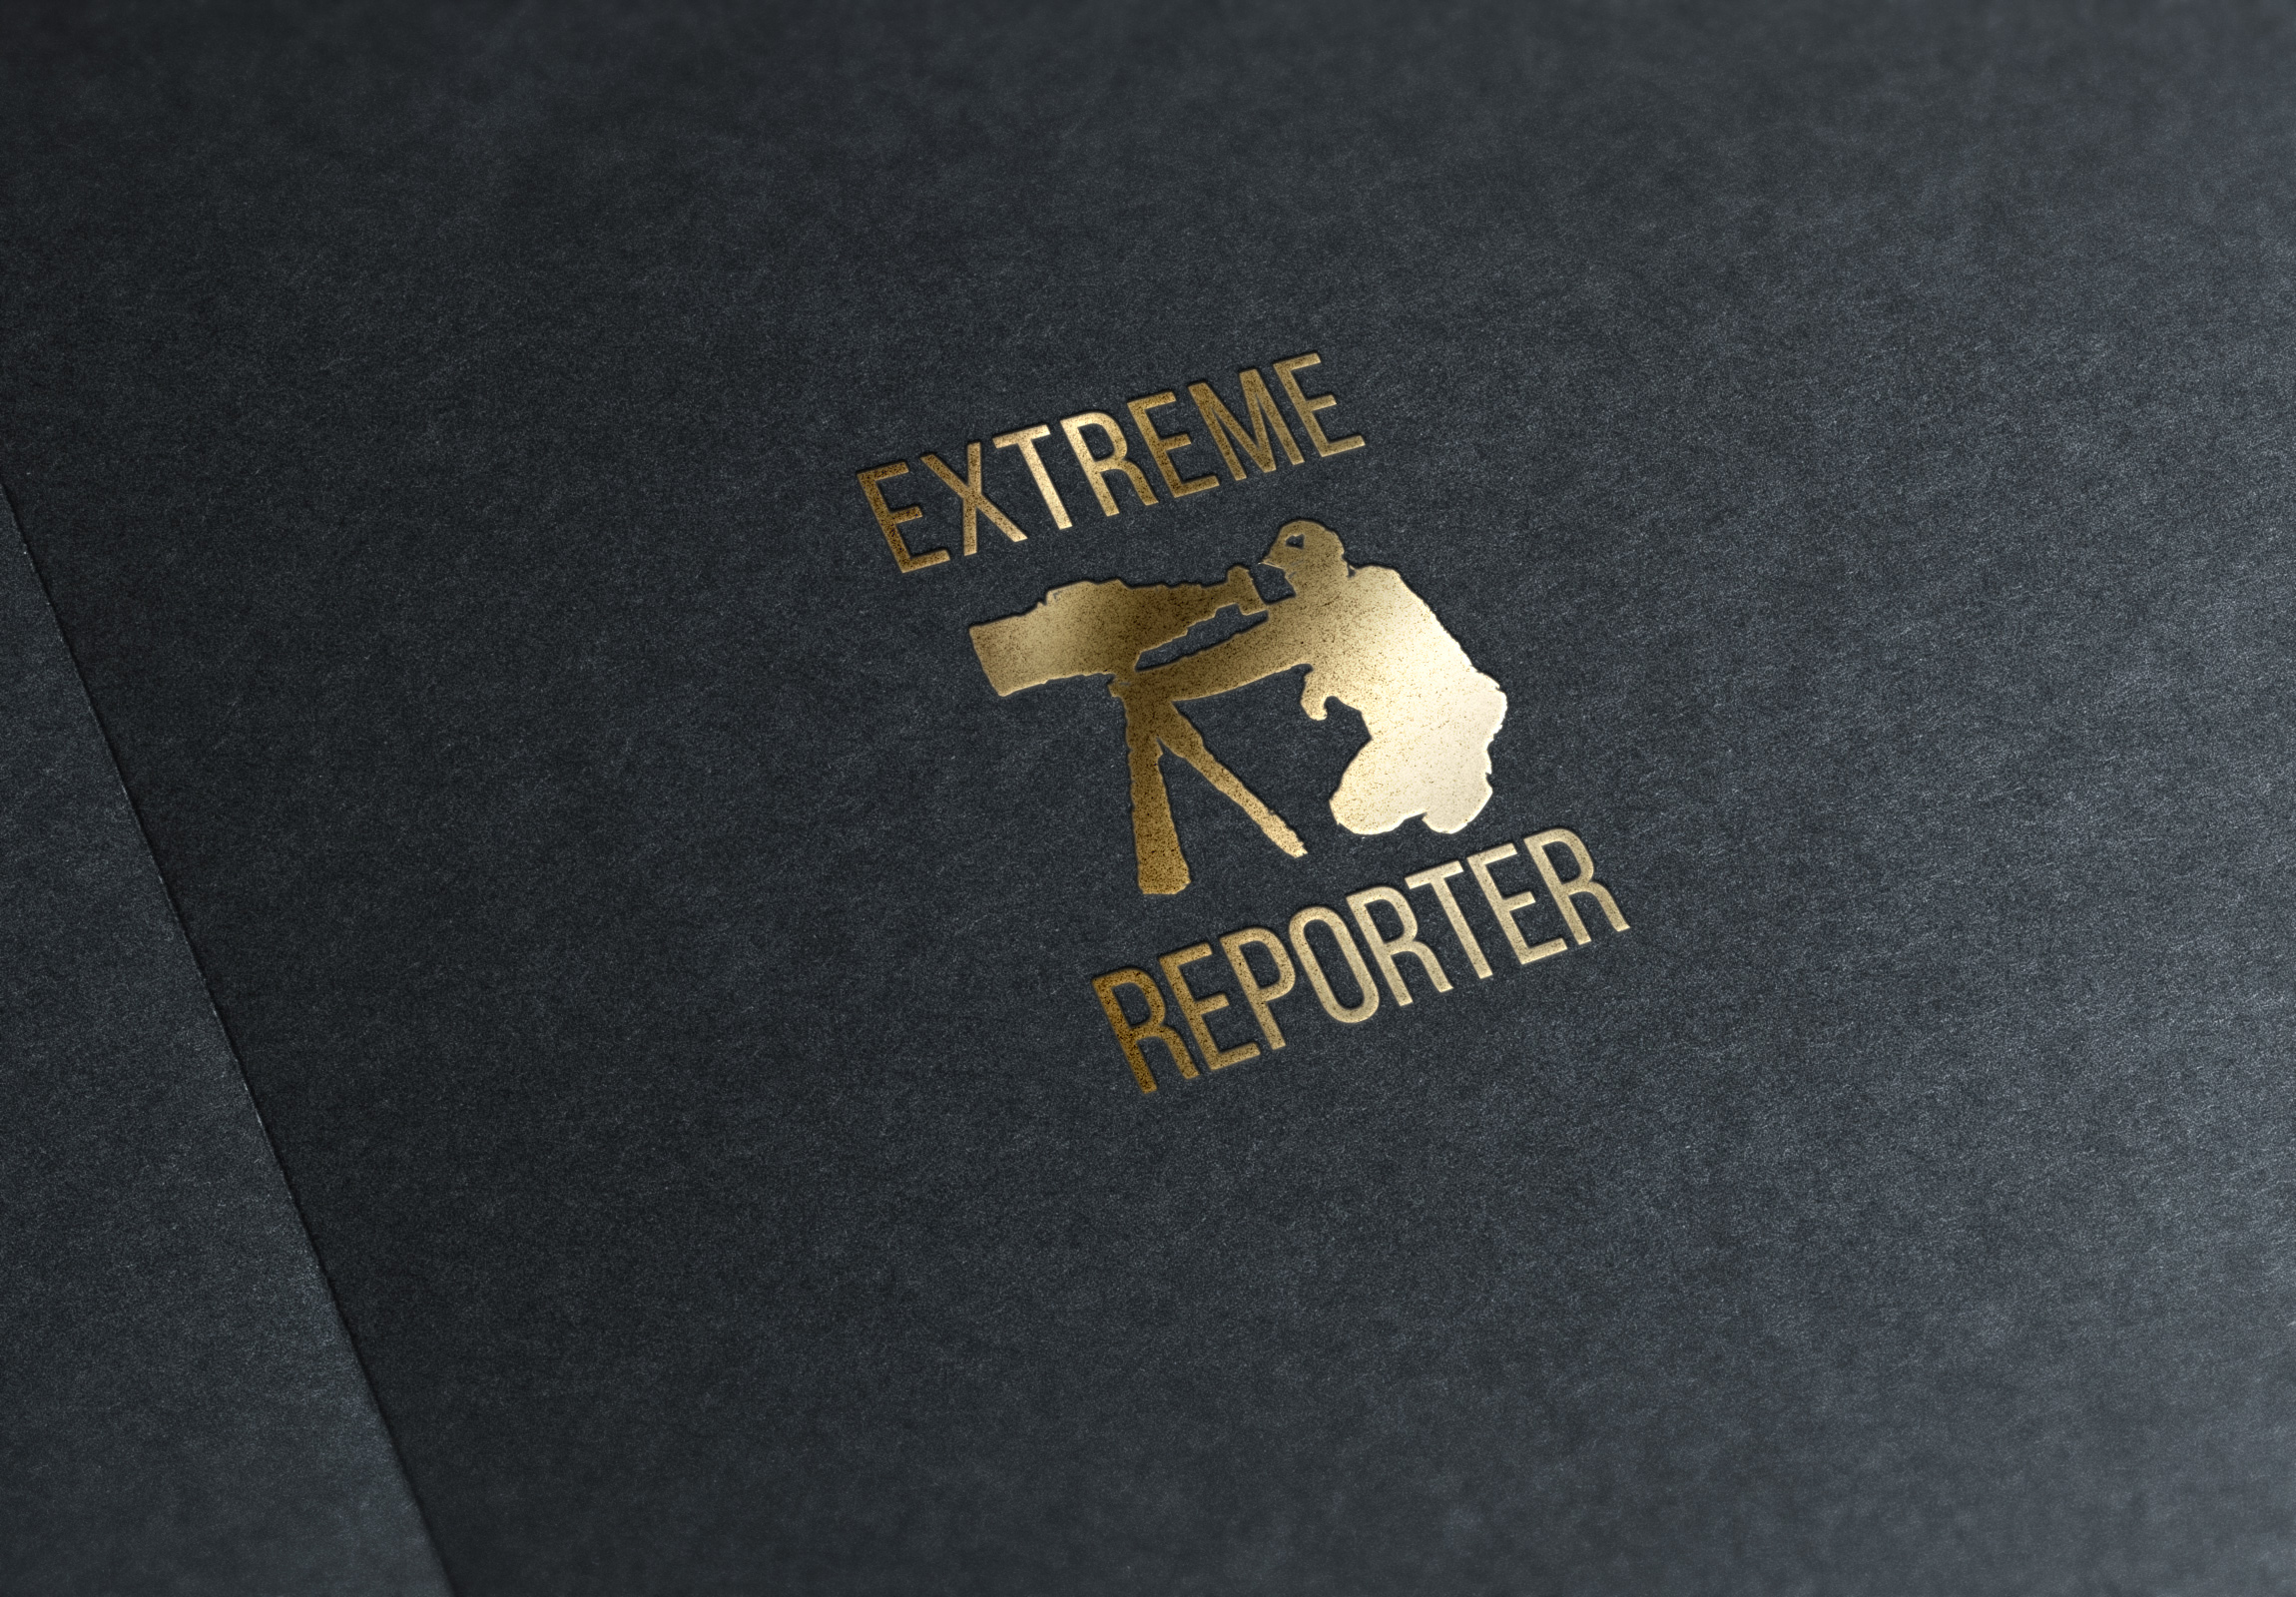 Логотип для экстрим фотографа.  фото f_8045a5232173c4cf.jpg